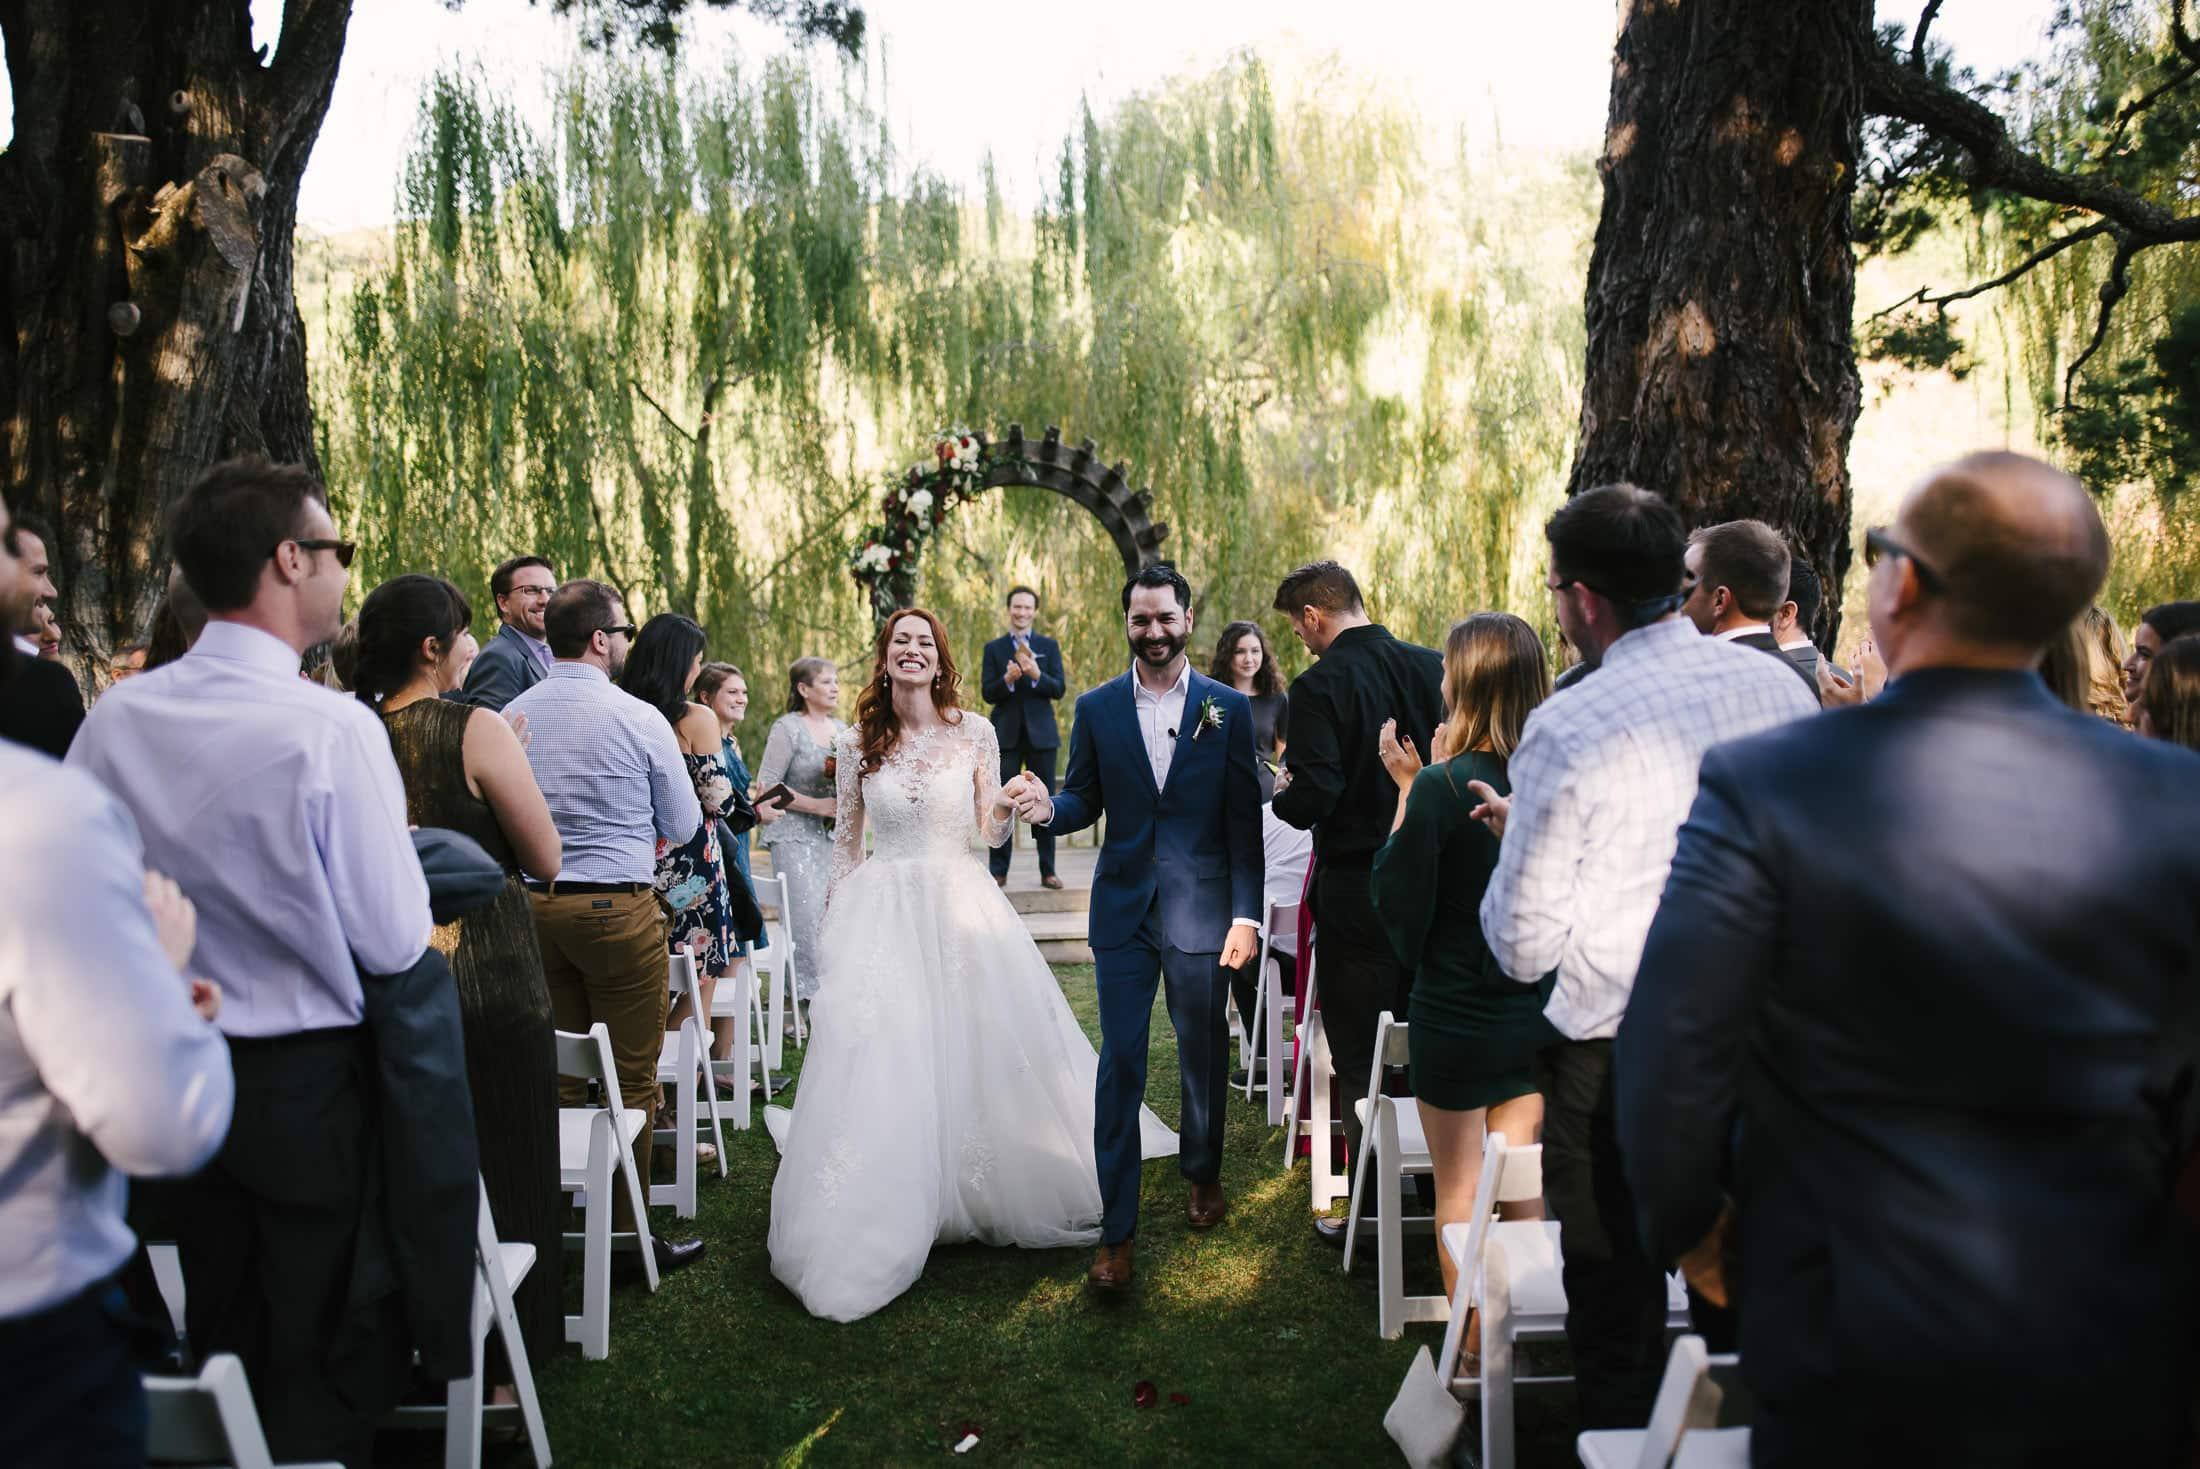 Radonich Ranch Wedding Ceremony